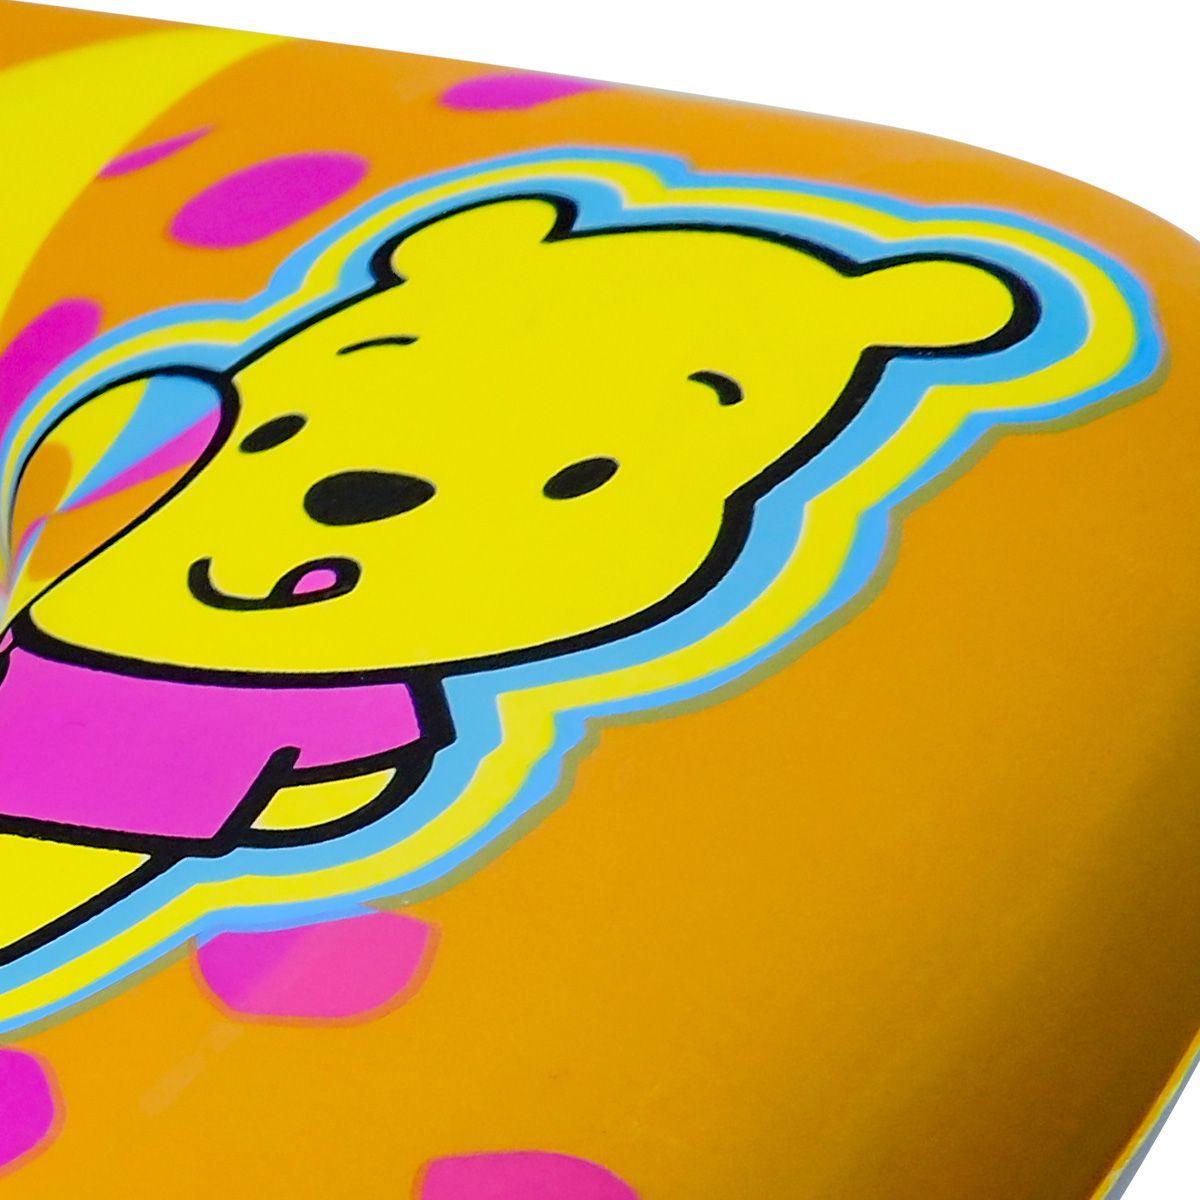 Adaptador Redutor Assento Vaso Sanitário Infantil Pooh Cuties Disney - Gedex